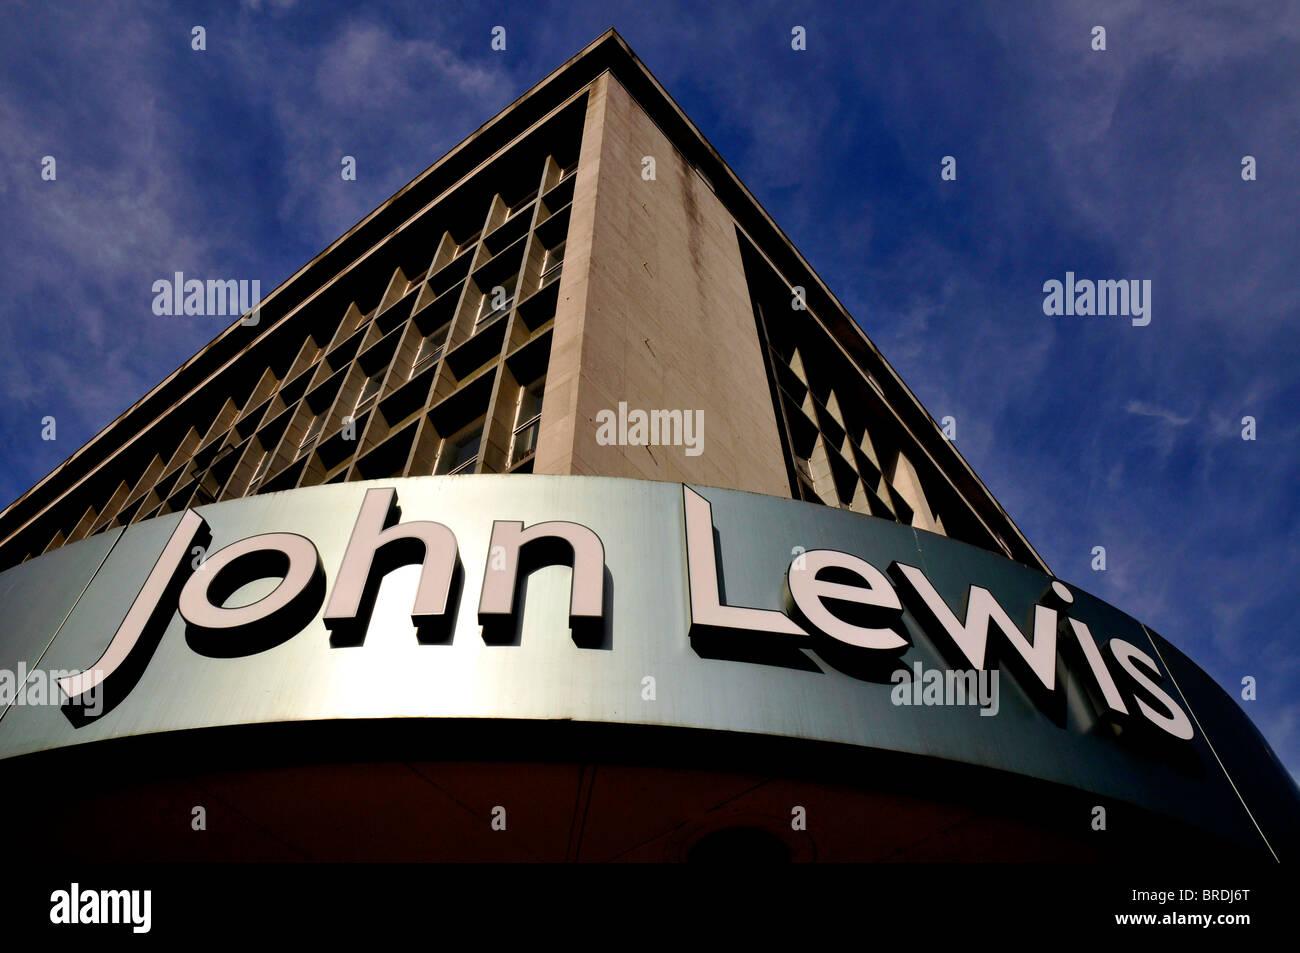 John Lewis department store in Oxford Street, London, Britain, UK - Stock Image